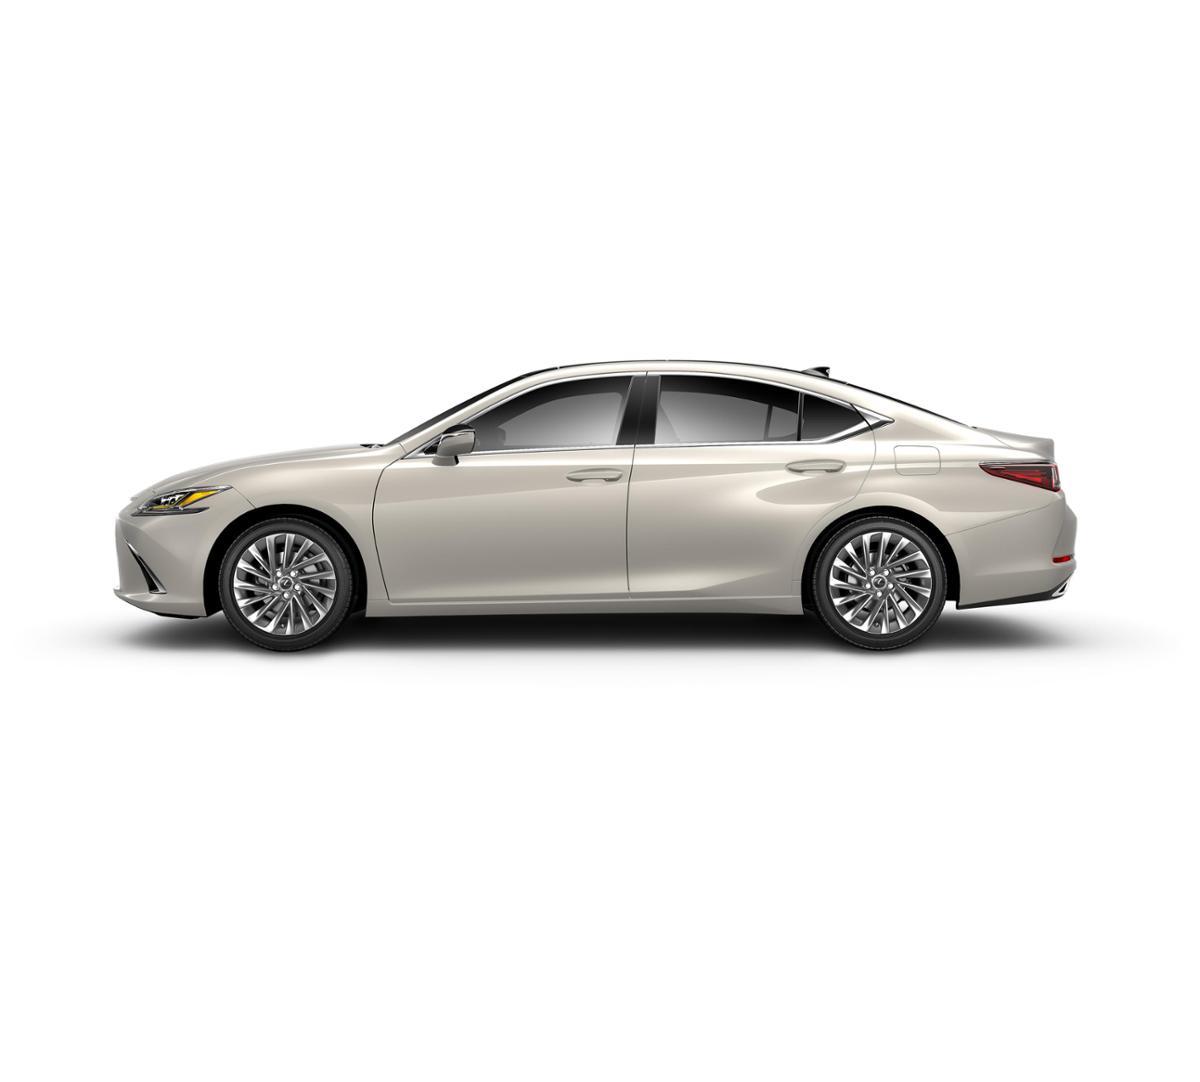 Audi Dealer Bay Area: New Moonbeam Beige Metallic 2019 Lexus ES 350 Ultra Luxury